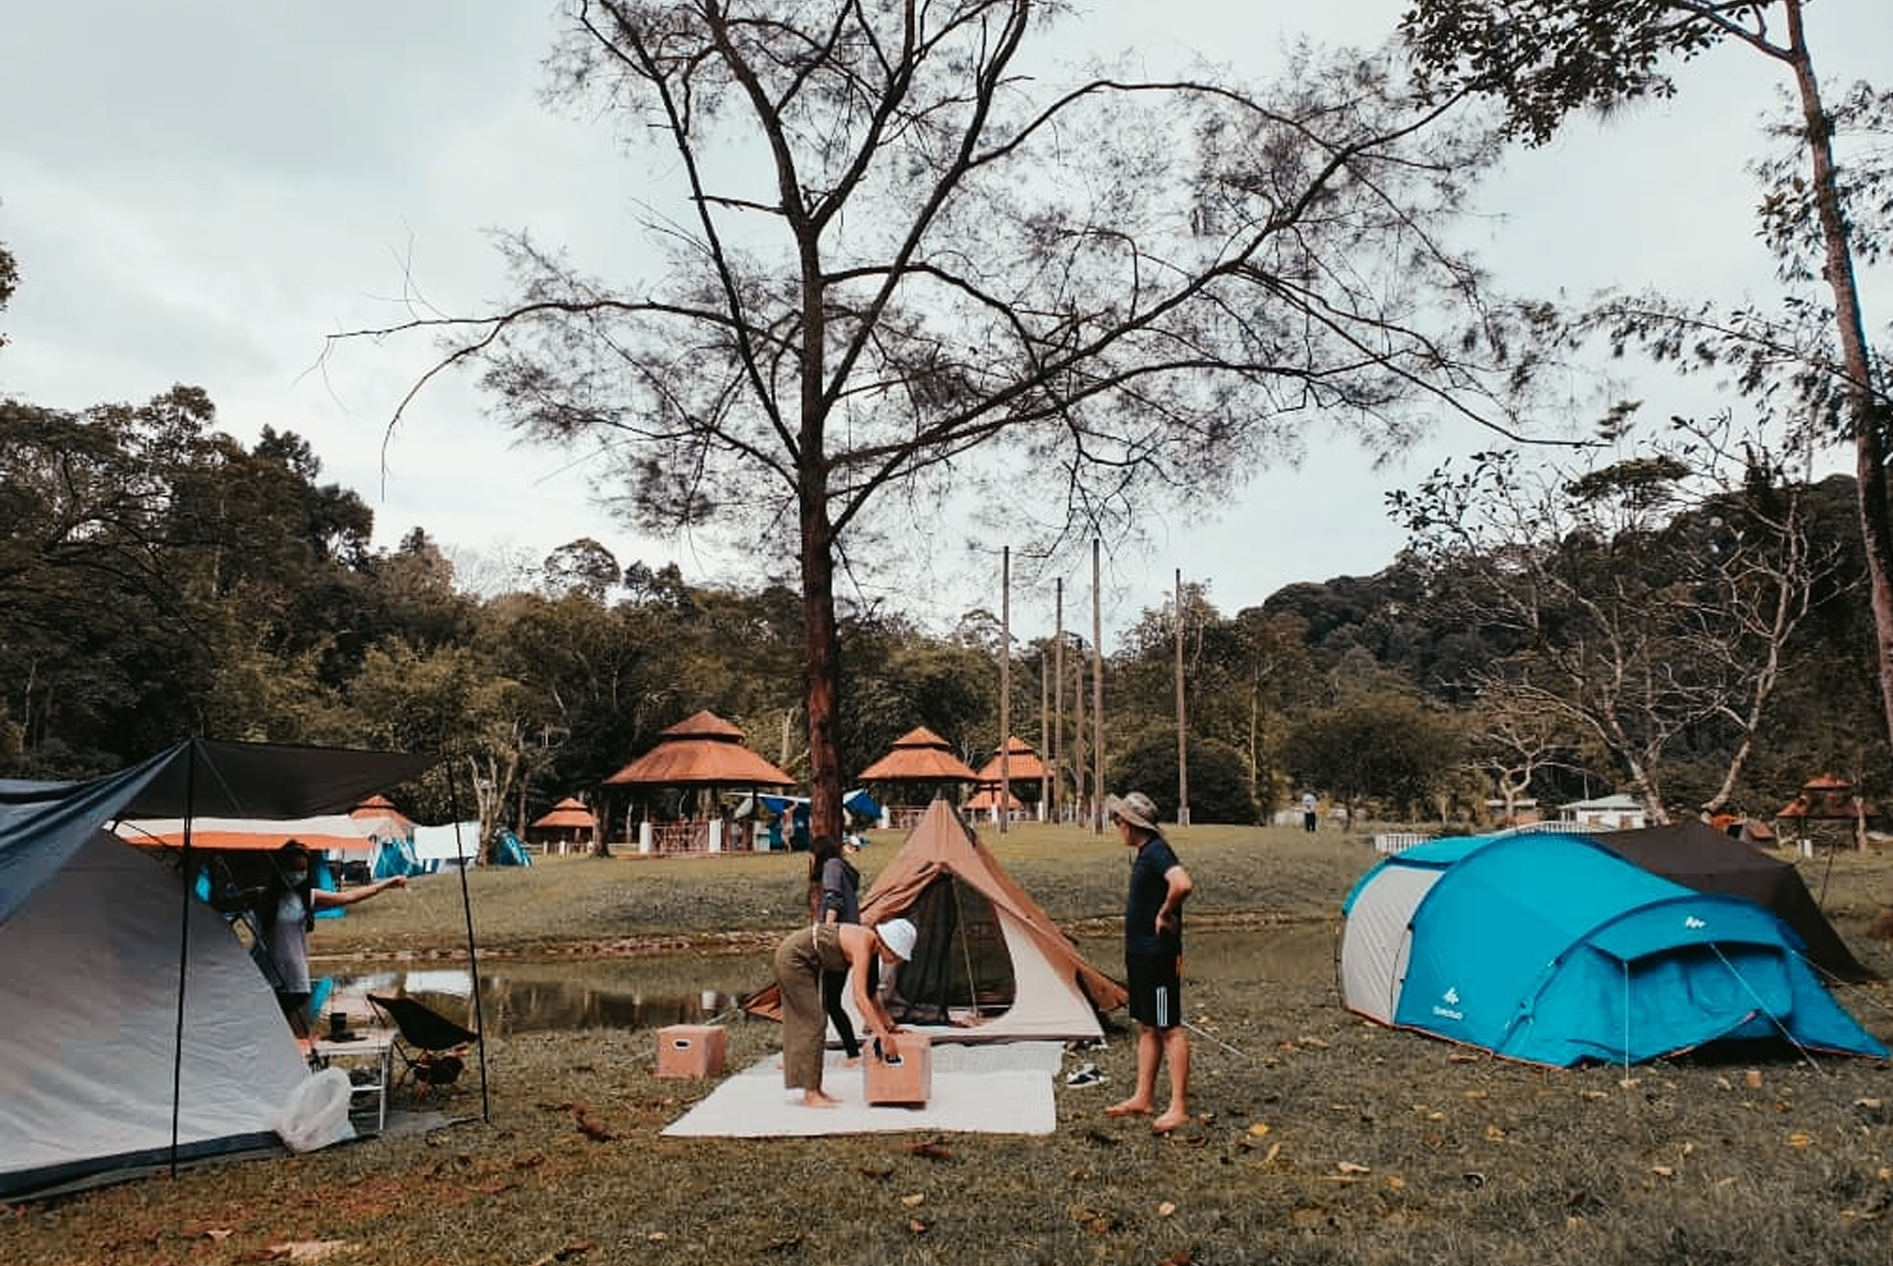 Resort_Taman_Rimba_Komanwel_Rawang_campsite_malaysia_car_camping_private_event_organizer-33